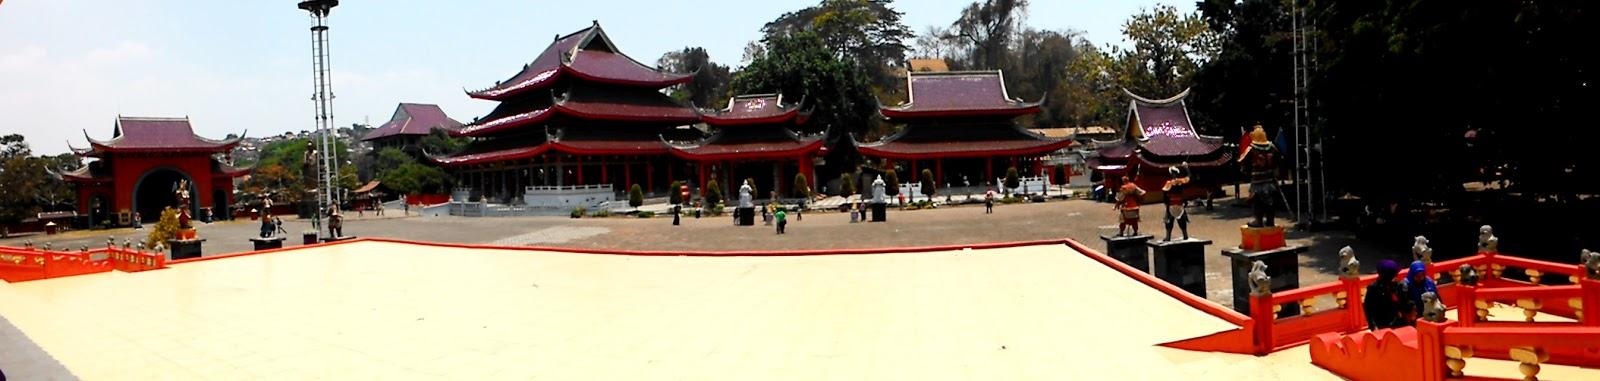 Plesiran Klenteng Sam Poo Kong Tujuan Wisata Bersejarah Kota Semarang